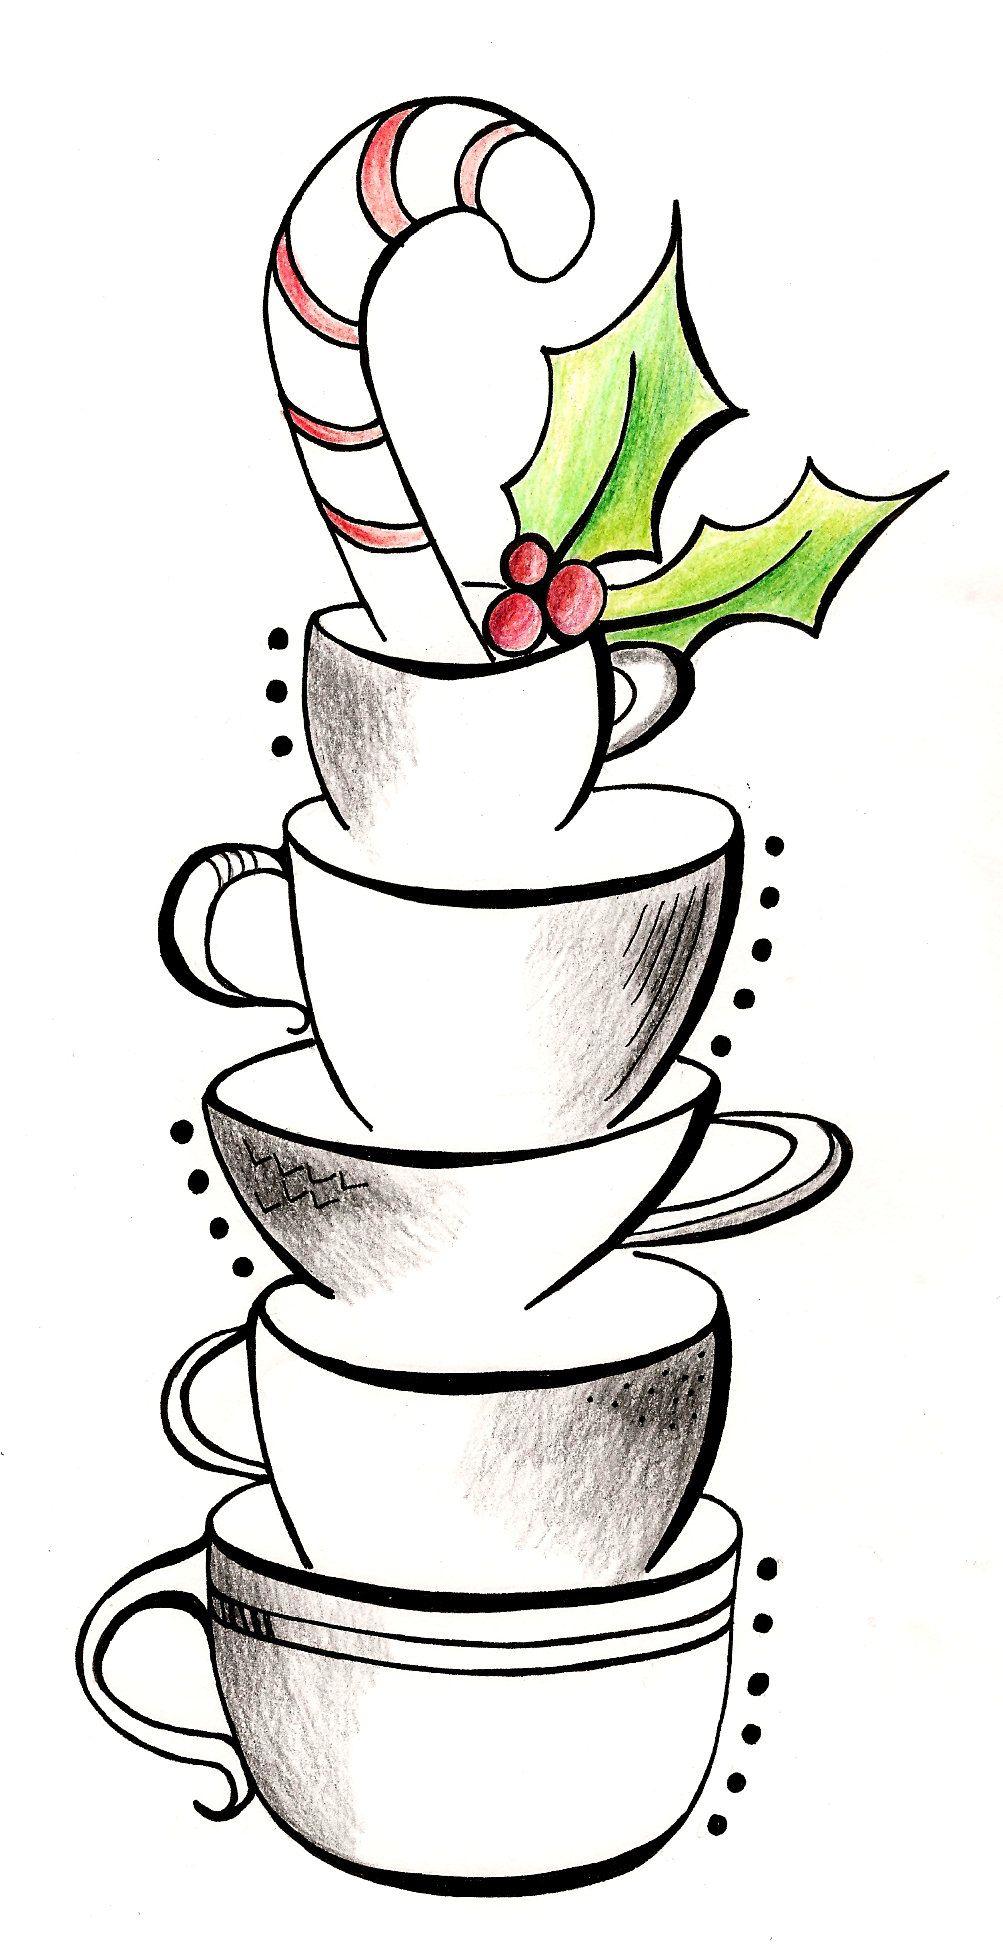 Terrific Cards Name Drawing Ideas Original Card Idea Original Card Idea Drawing Ideas ideas Christmas Drawing Ideas